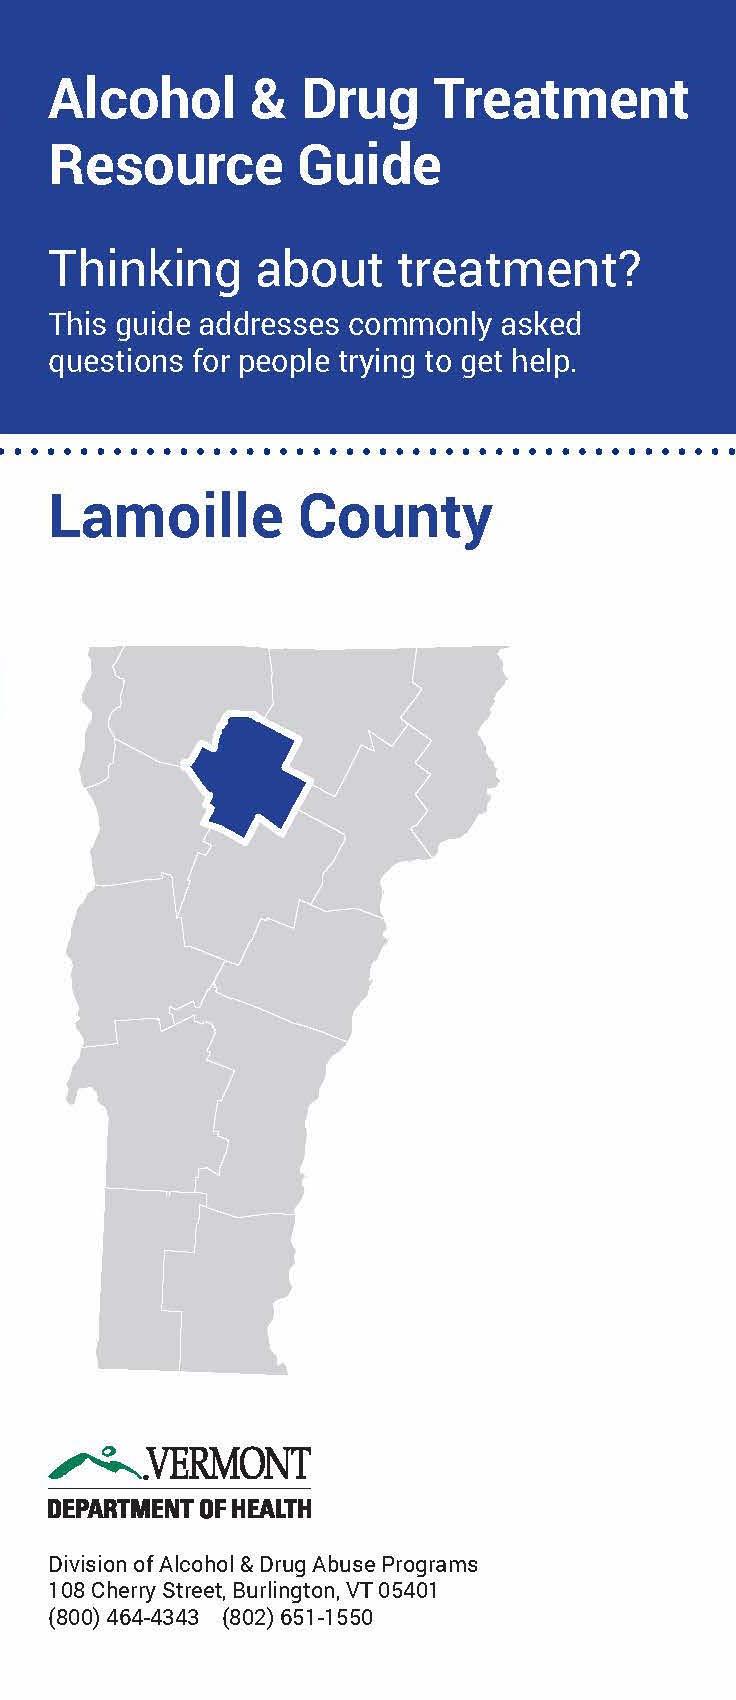 Lamoille County